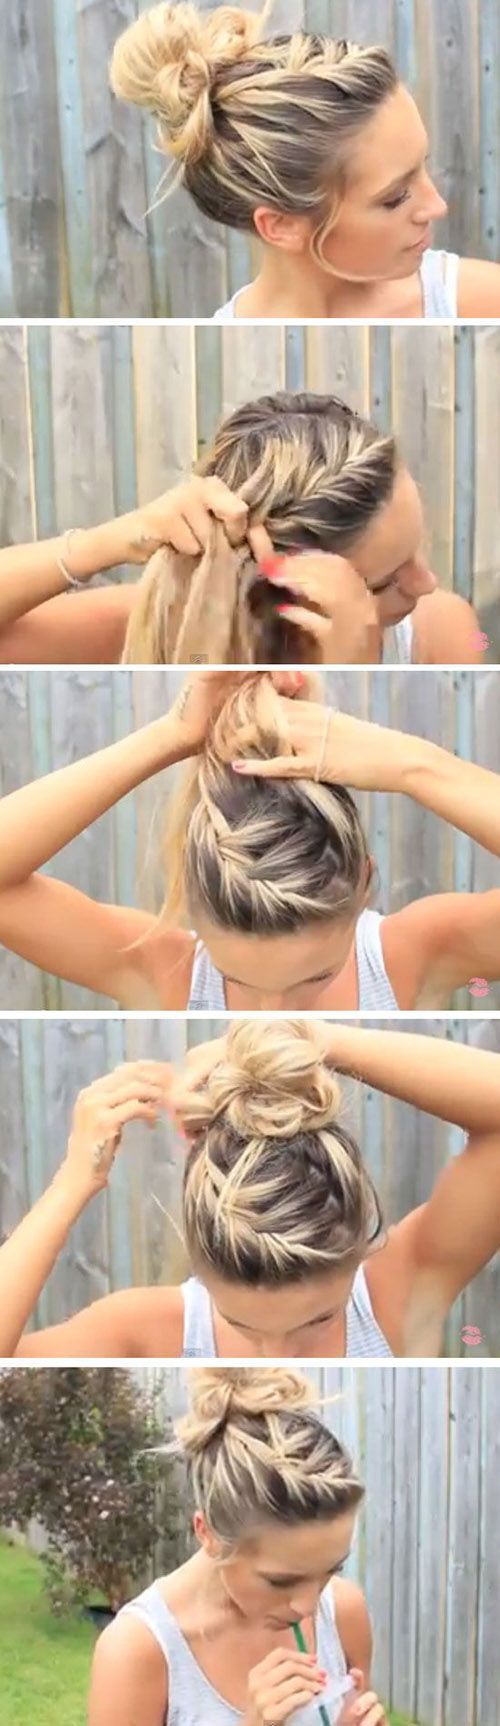 easy diy hairstyles for the beach | hair | hair styles, hair